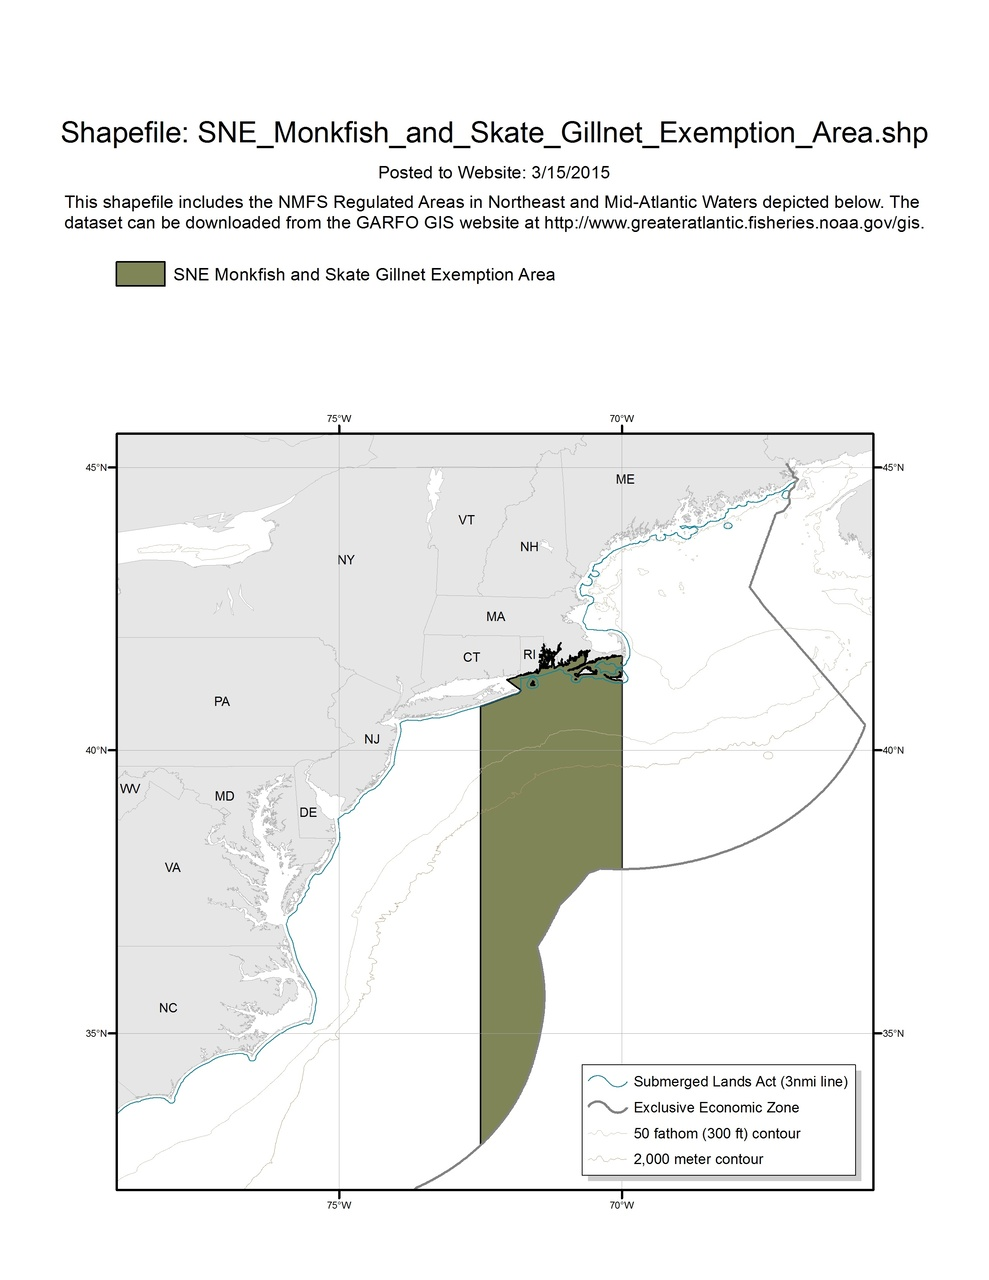 SNE_Monkfish_and_Skate_Gillnet_Exemption_Area_MAP.jpg